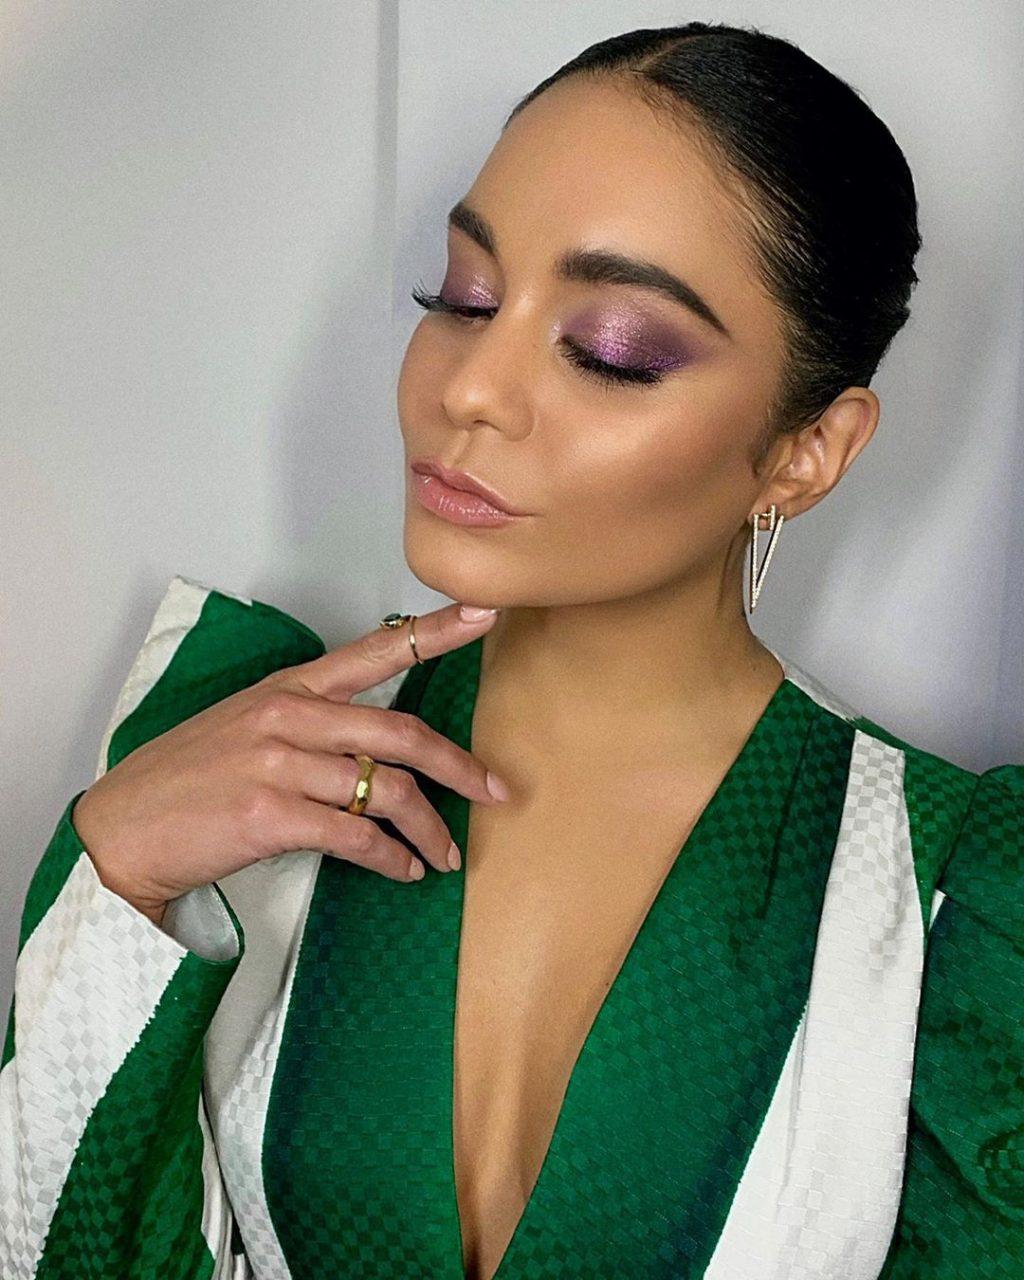 Vanessa Hudgens Sexy (91 Photos + Videos)